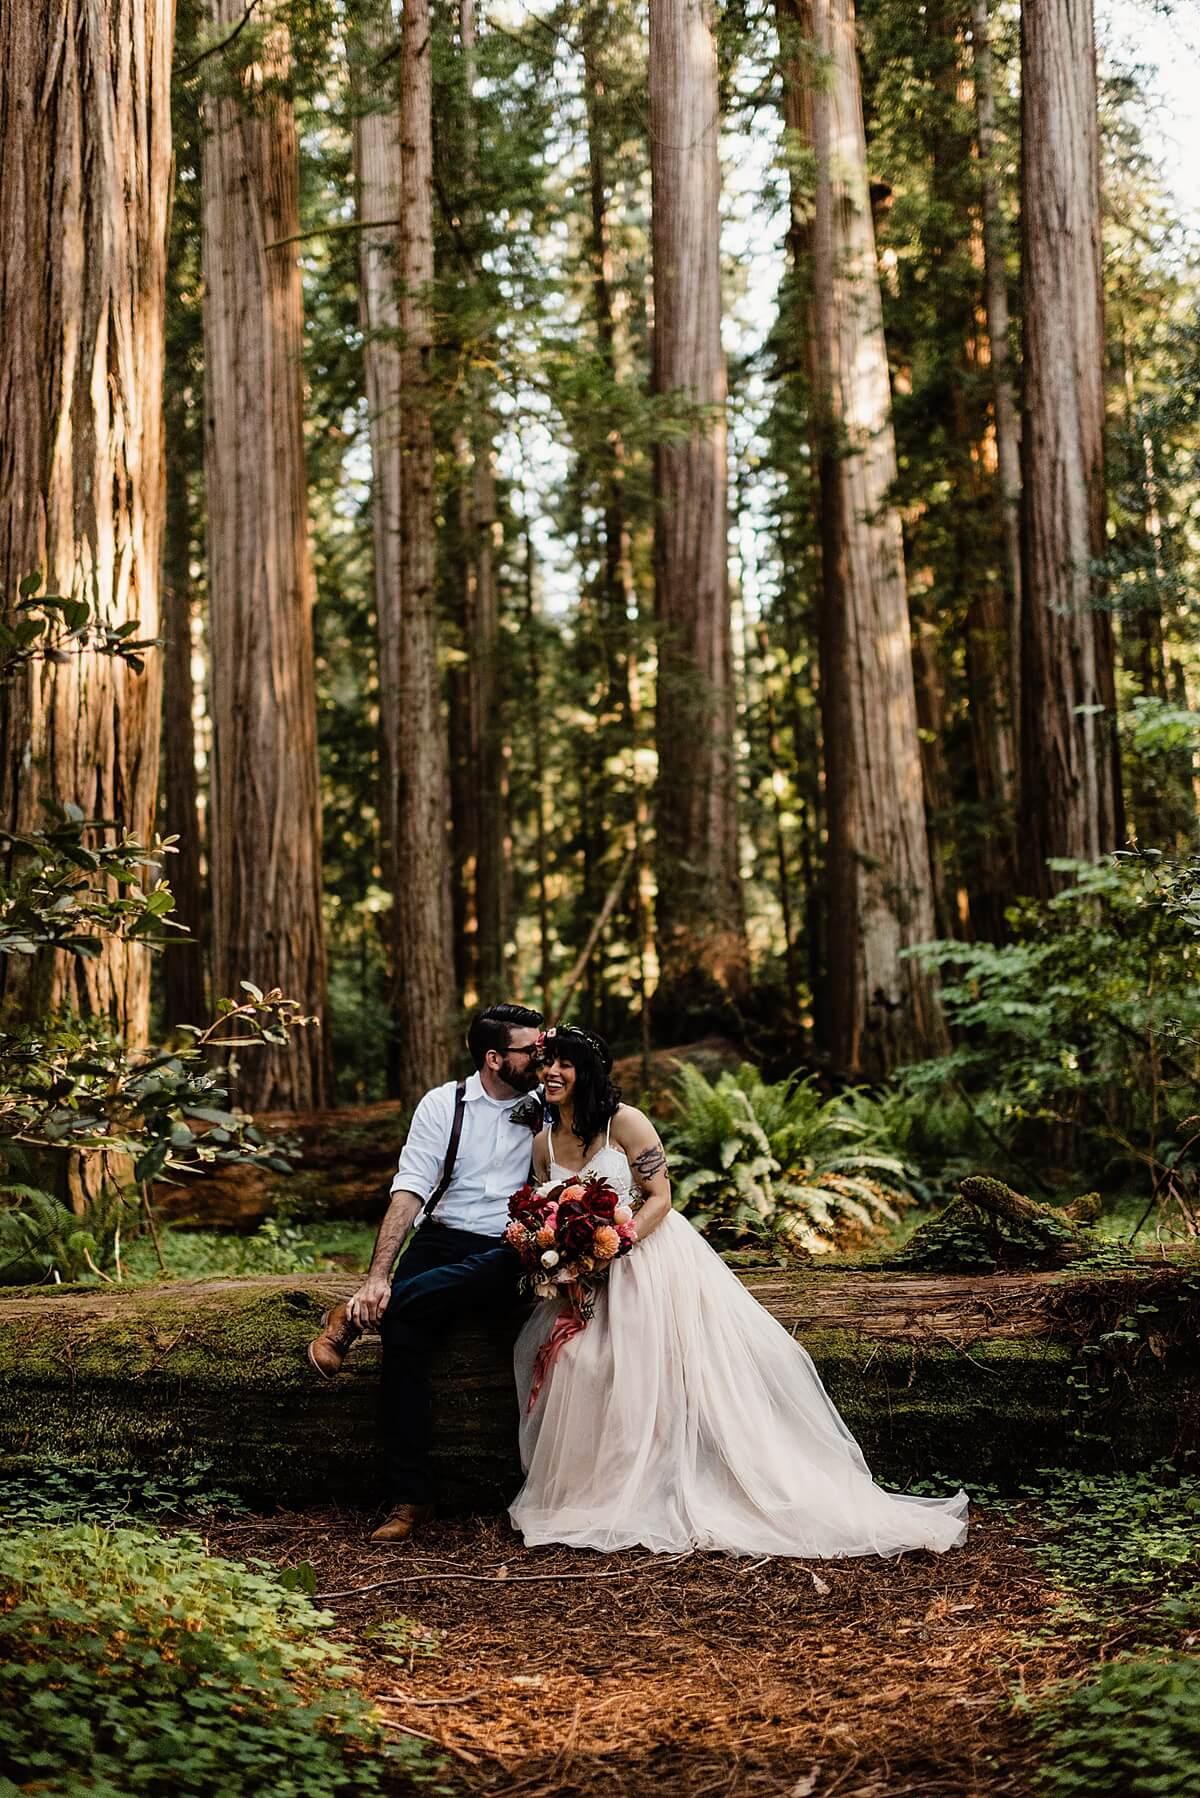 Allison-Brooks-Jedediah-Smiith-Redwoods-Adventure-Elopement-Wedding-S-Photography-Blog_0046.jpg